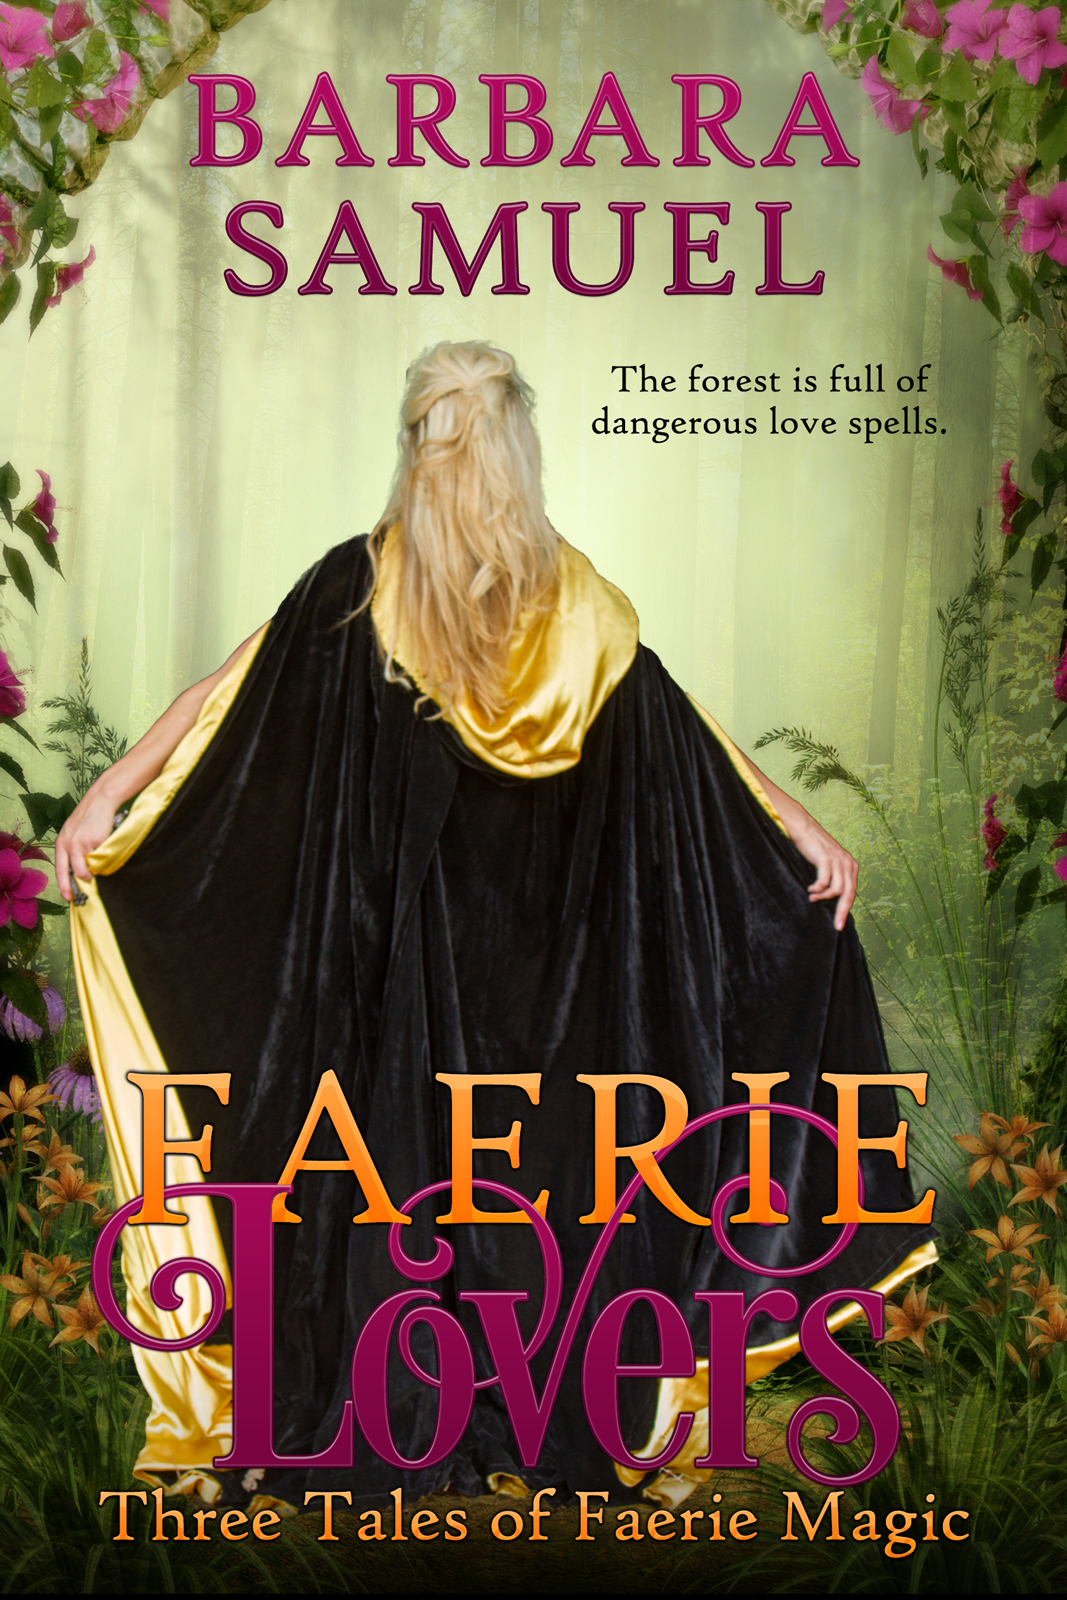 BarbaraSamuel_FaerieLovers_1600